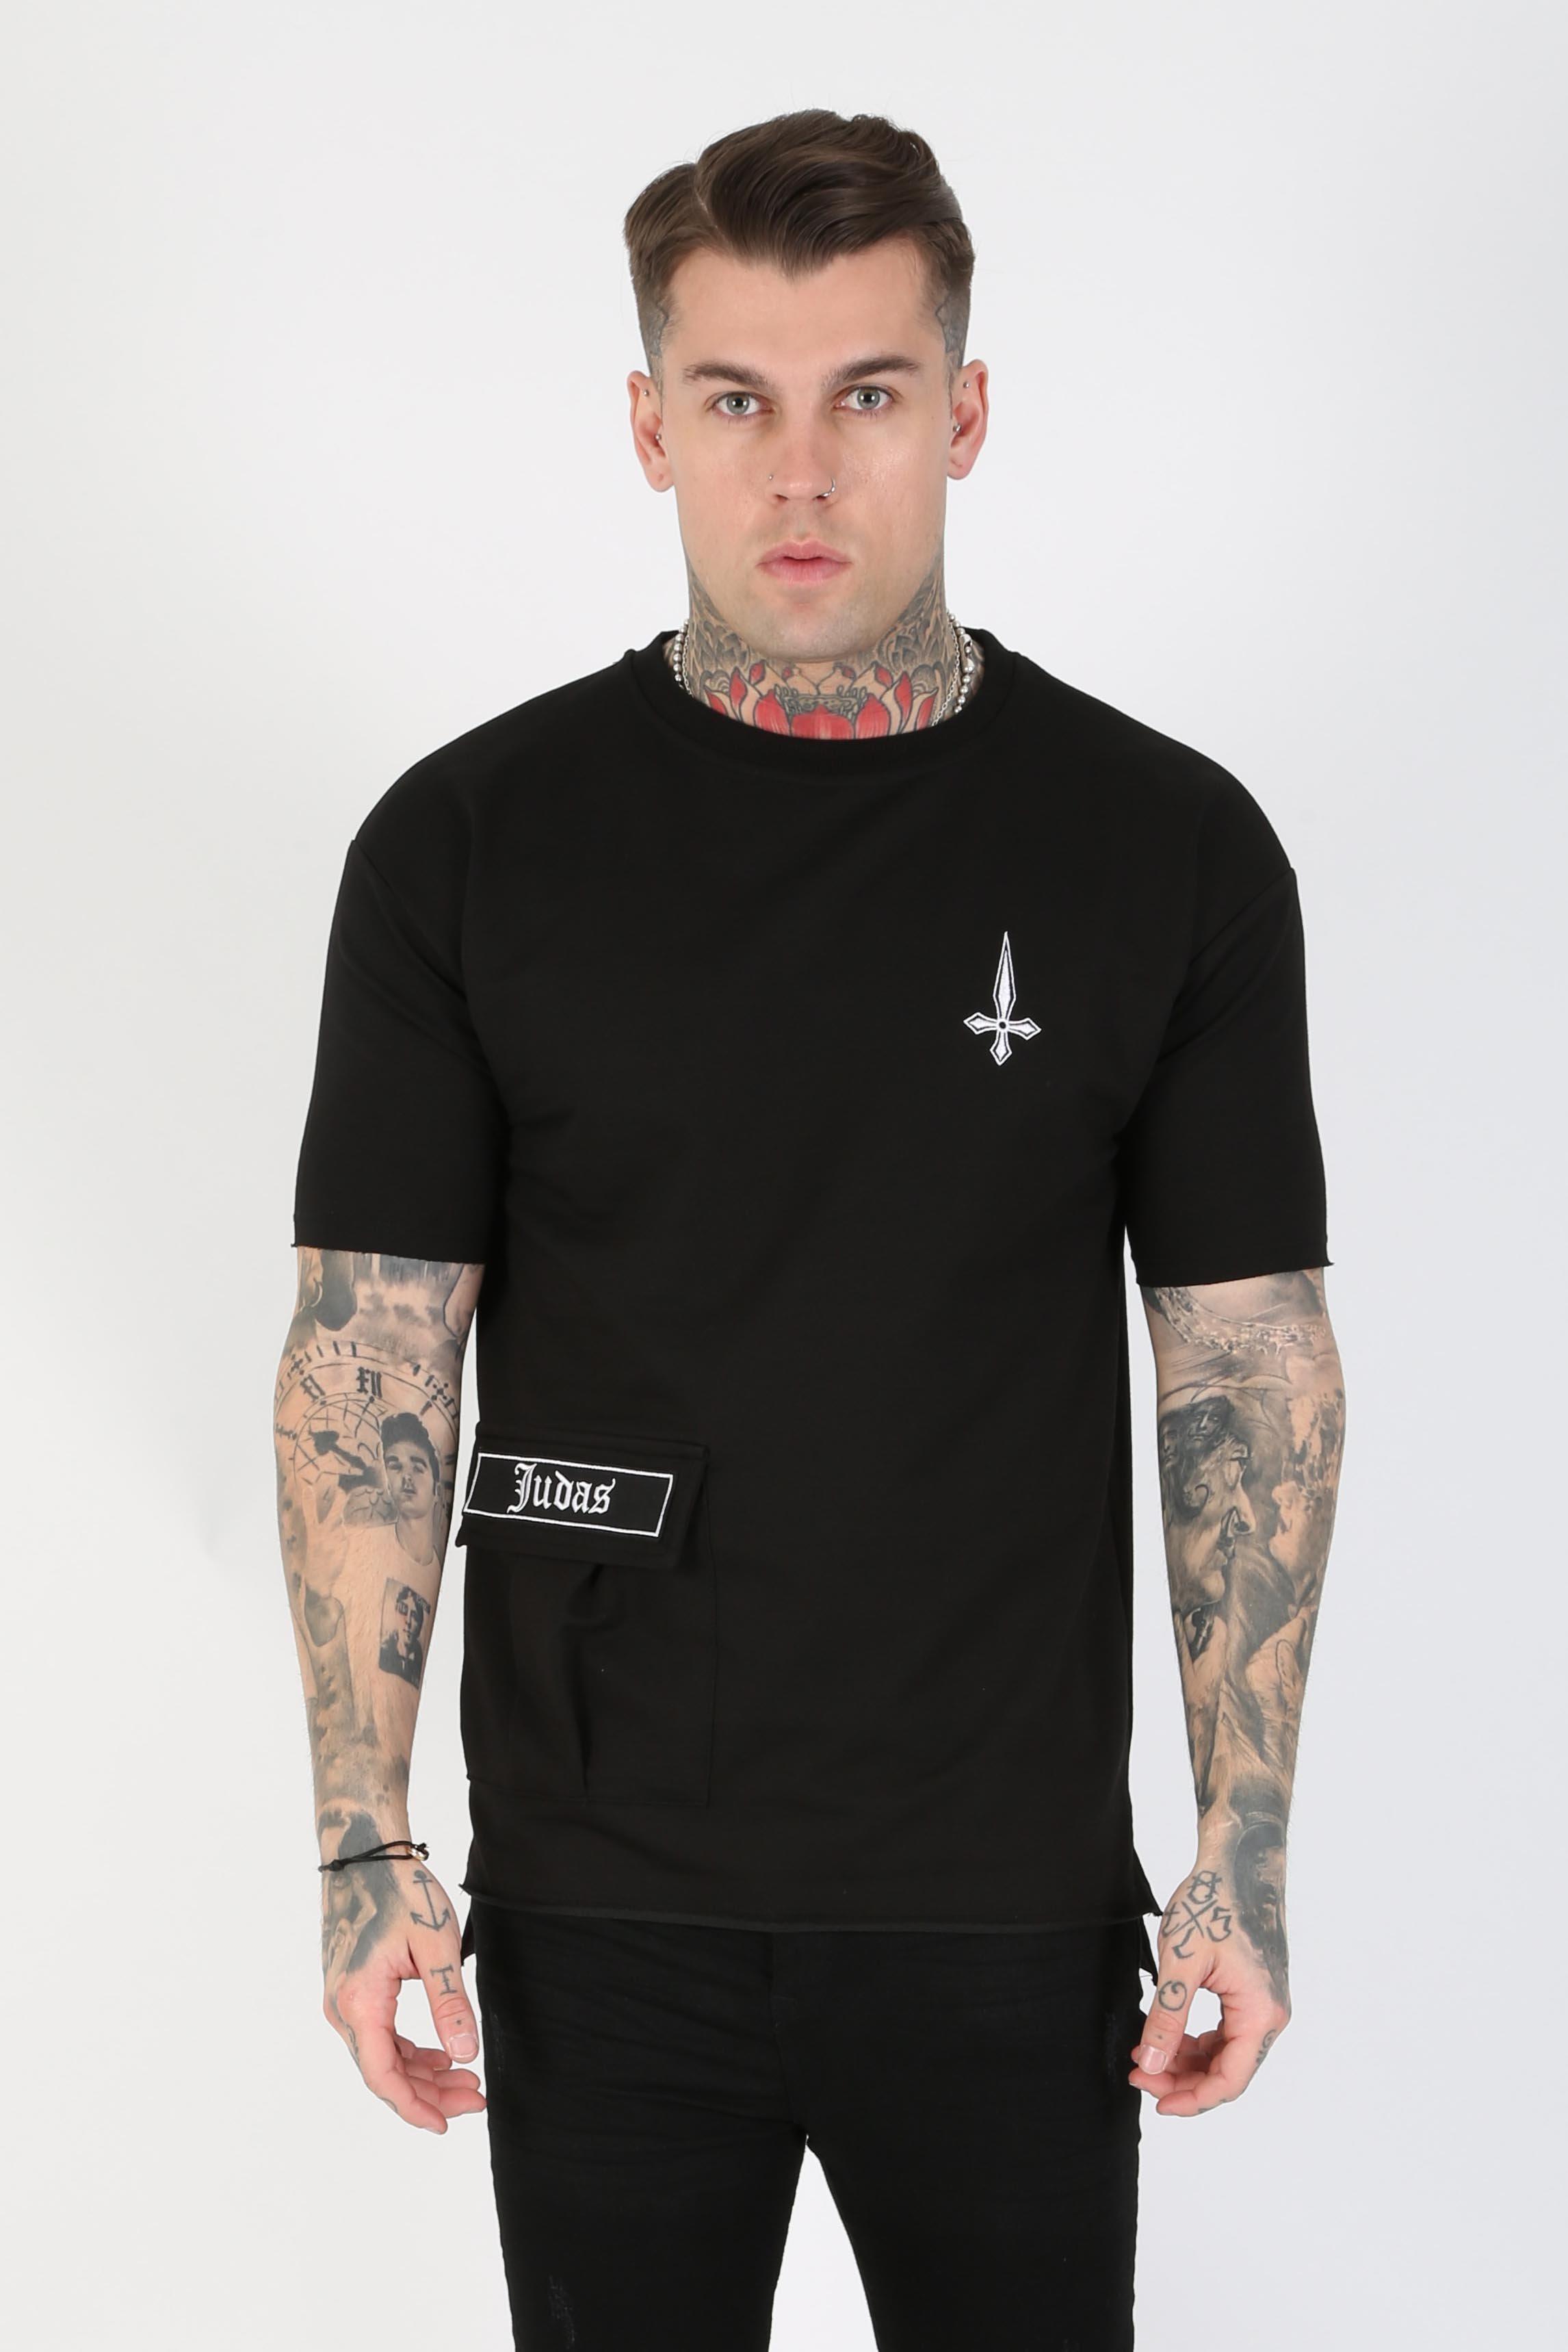 Stant Pocket Detail Men's T-Shirt - Black, X-Large